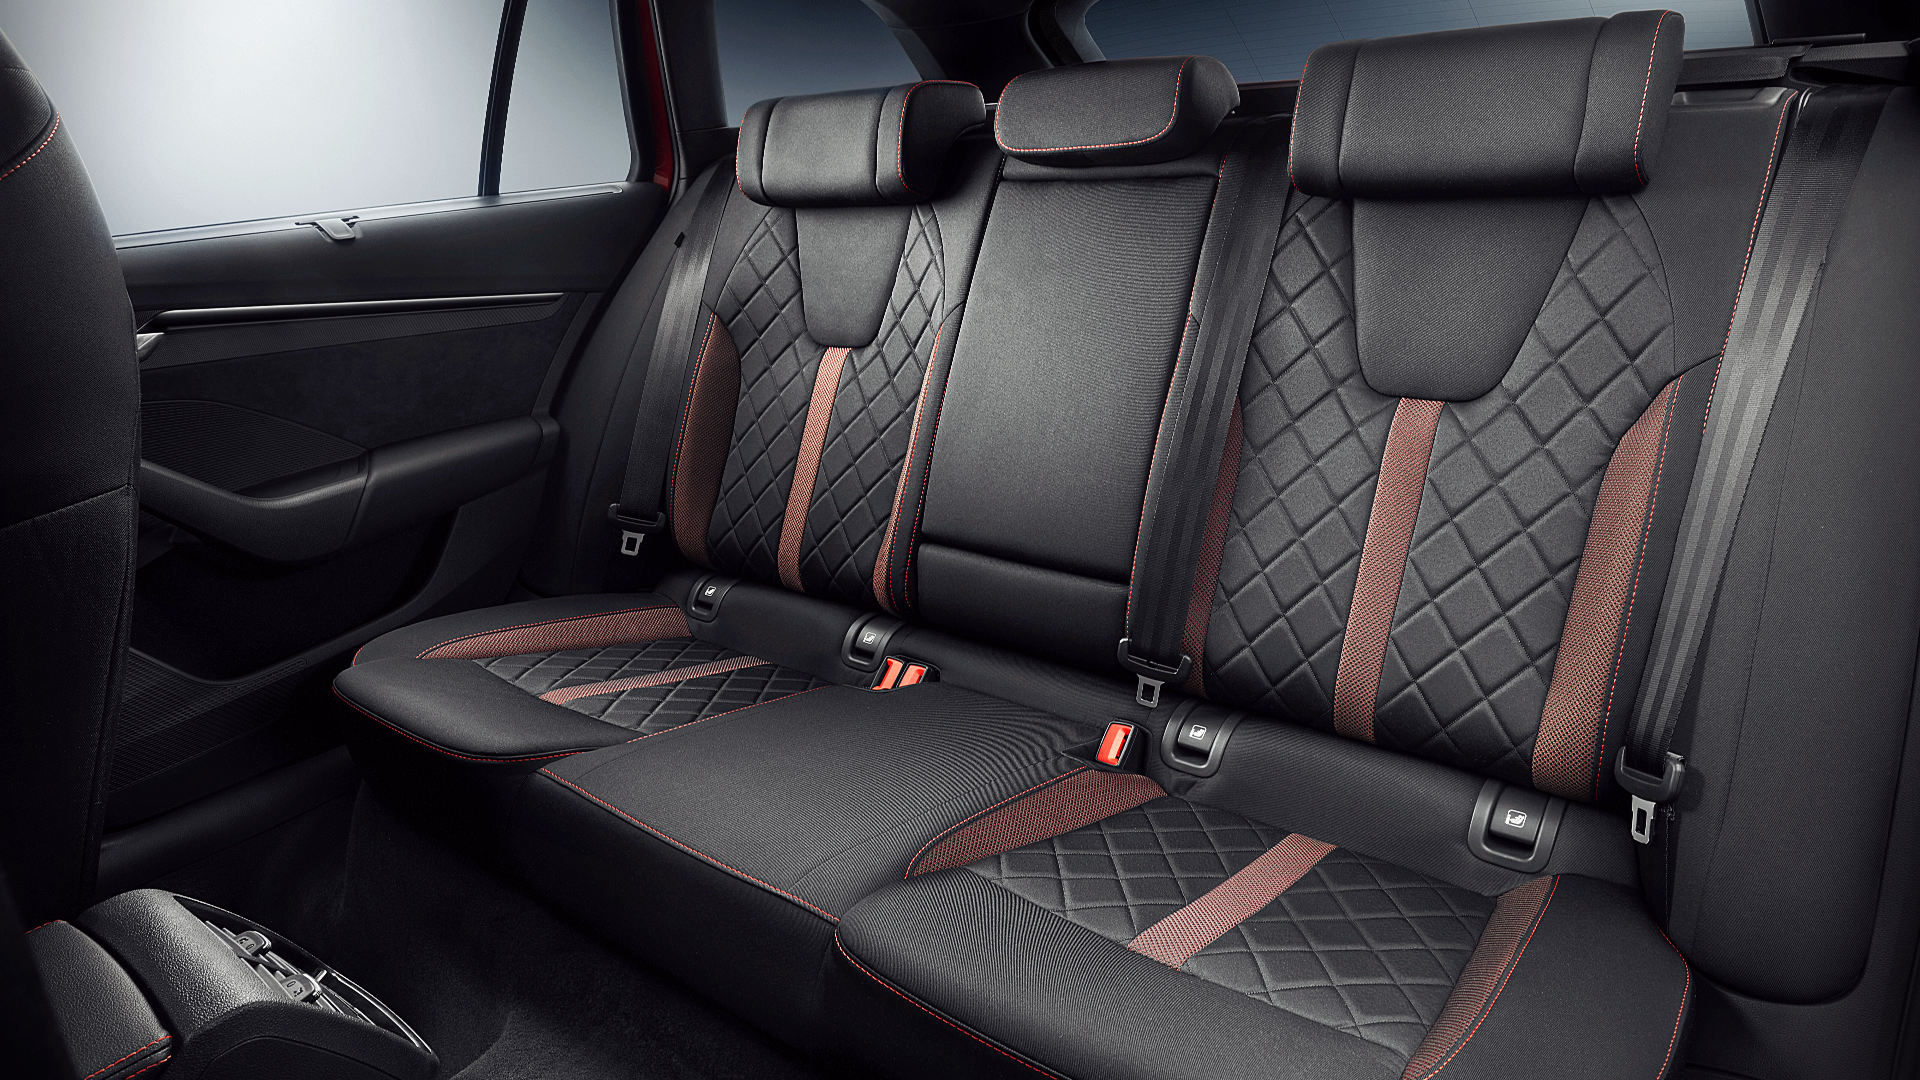 Skoda Octavia RS iV 2020 Seats Interior